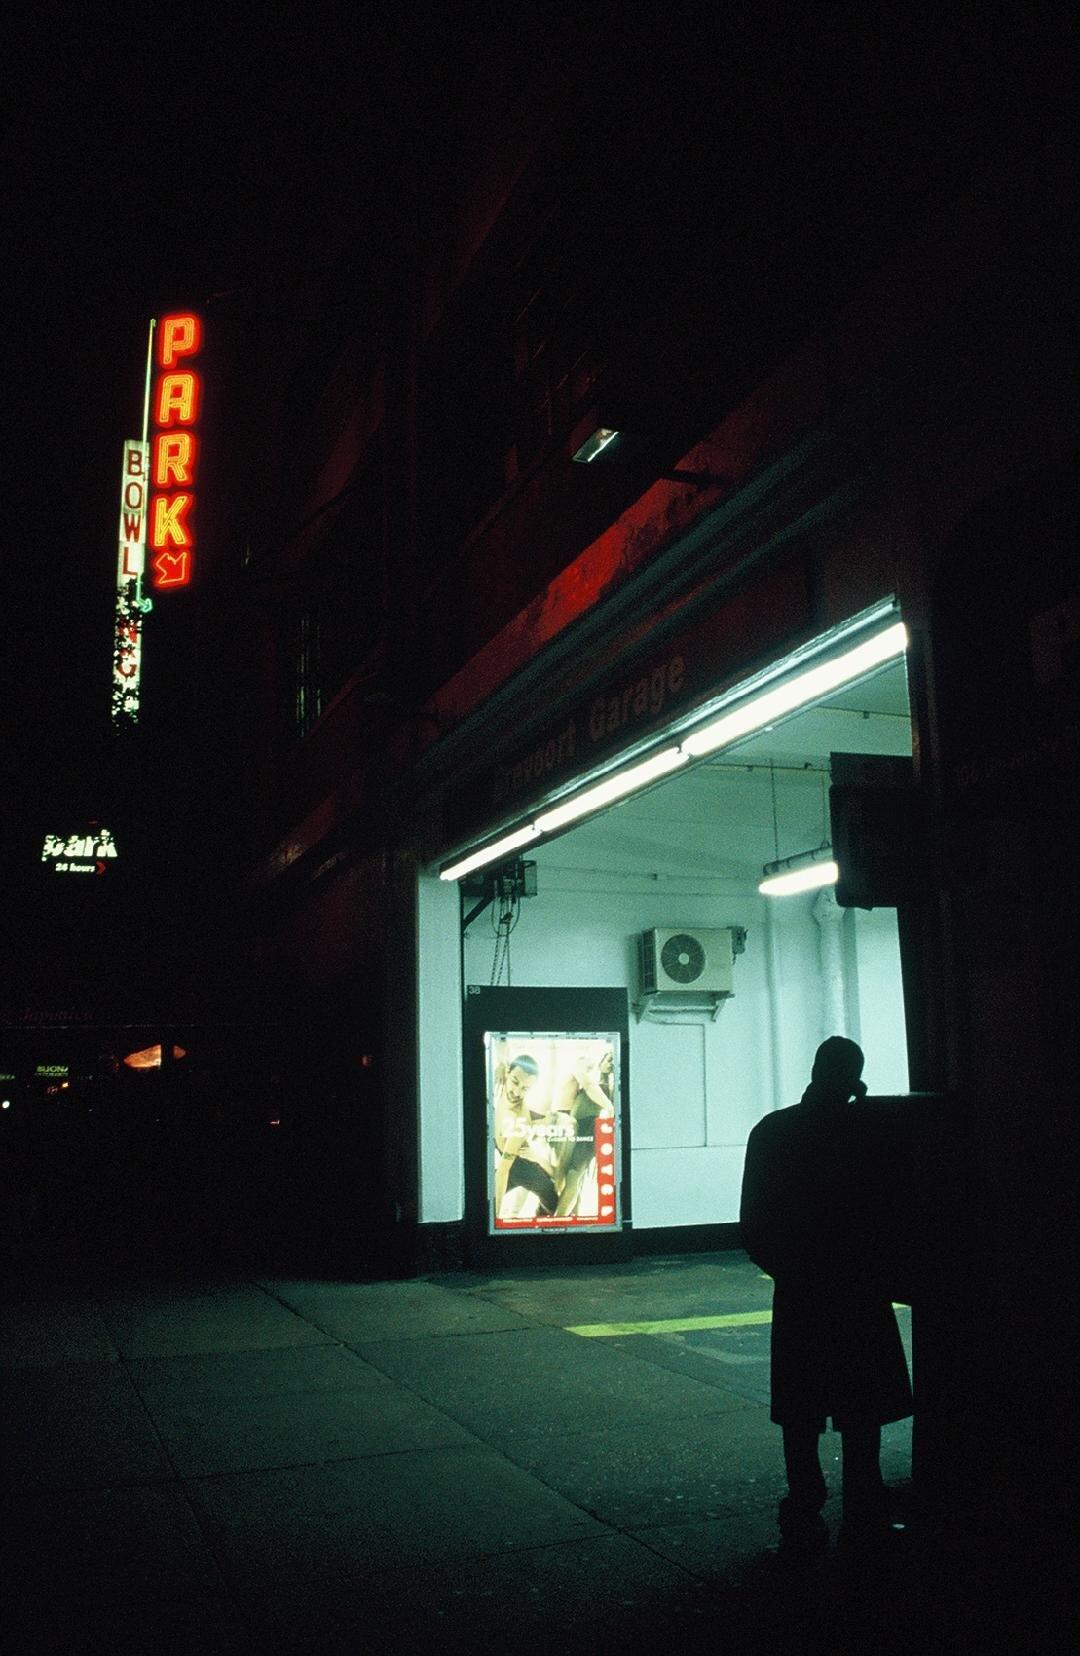 Man on the phone, University Place (2004)